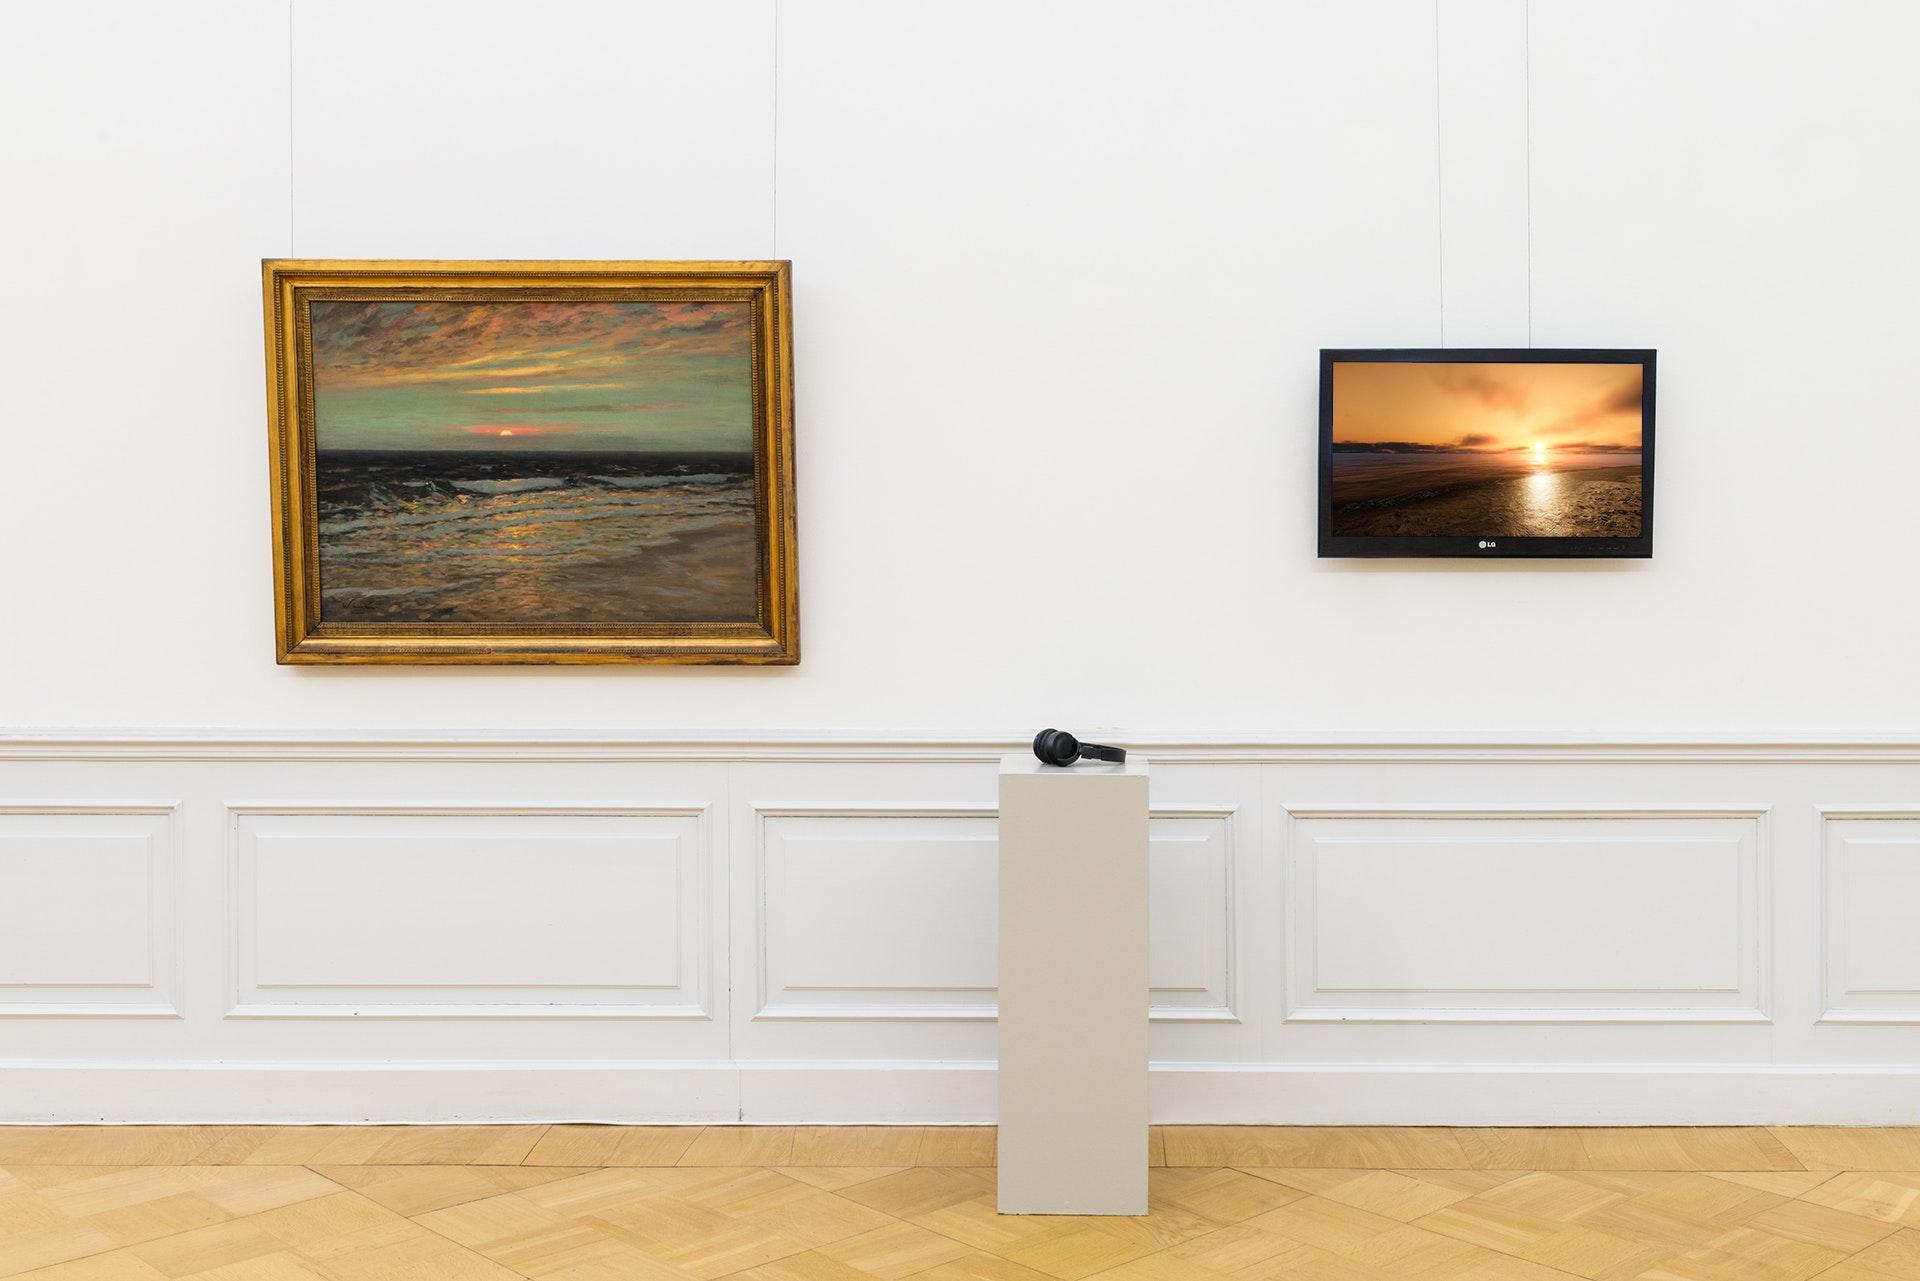 Sebastian Wanke, Sonnenuntergang an der Küste, Lindenau